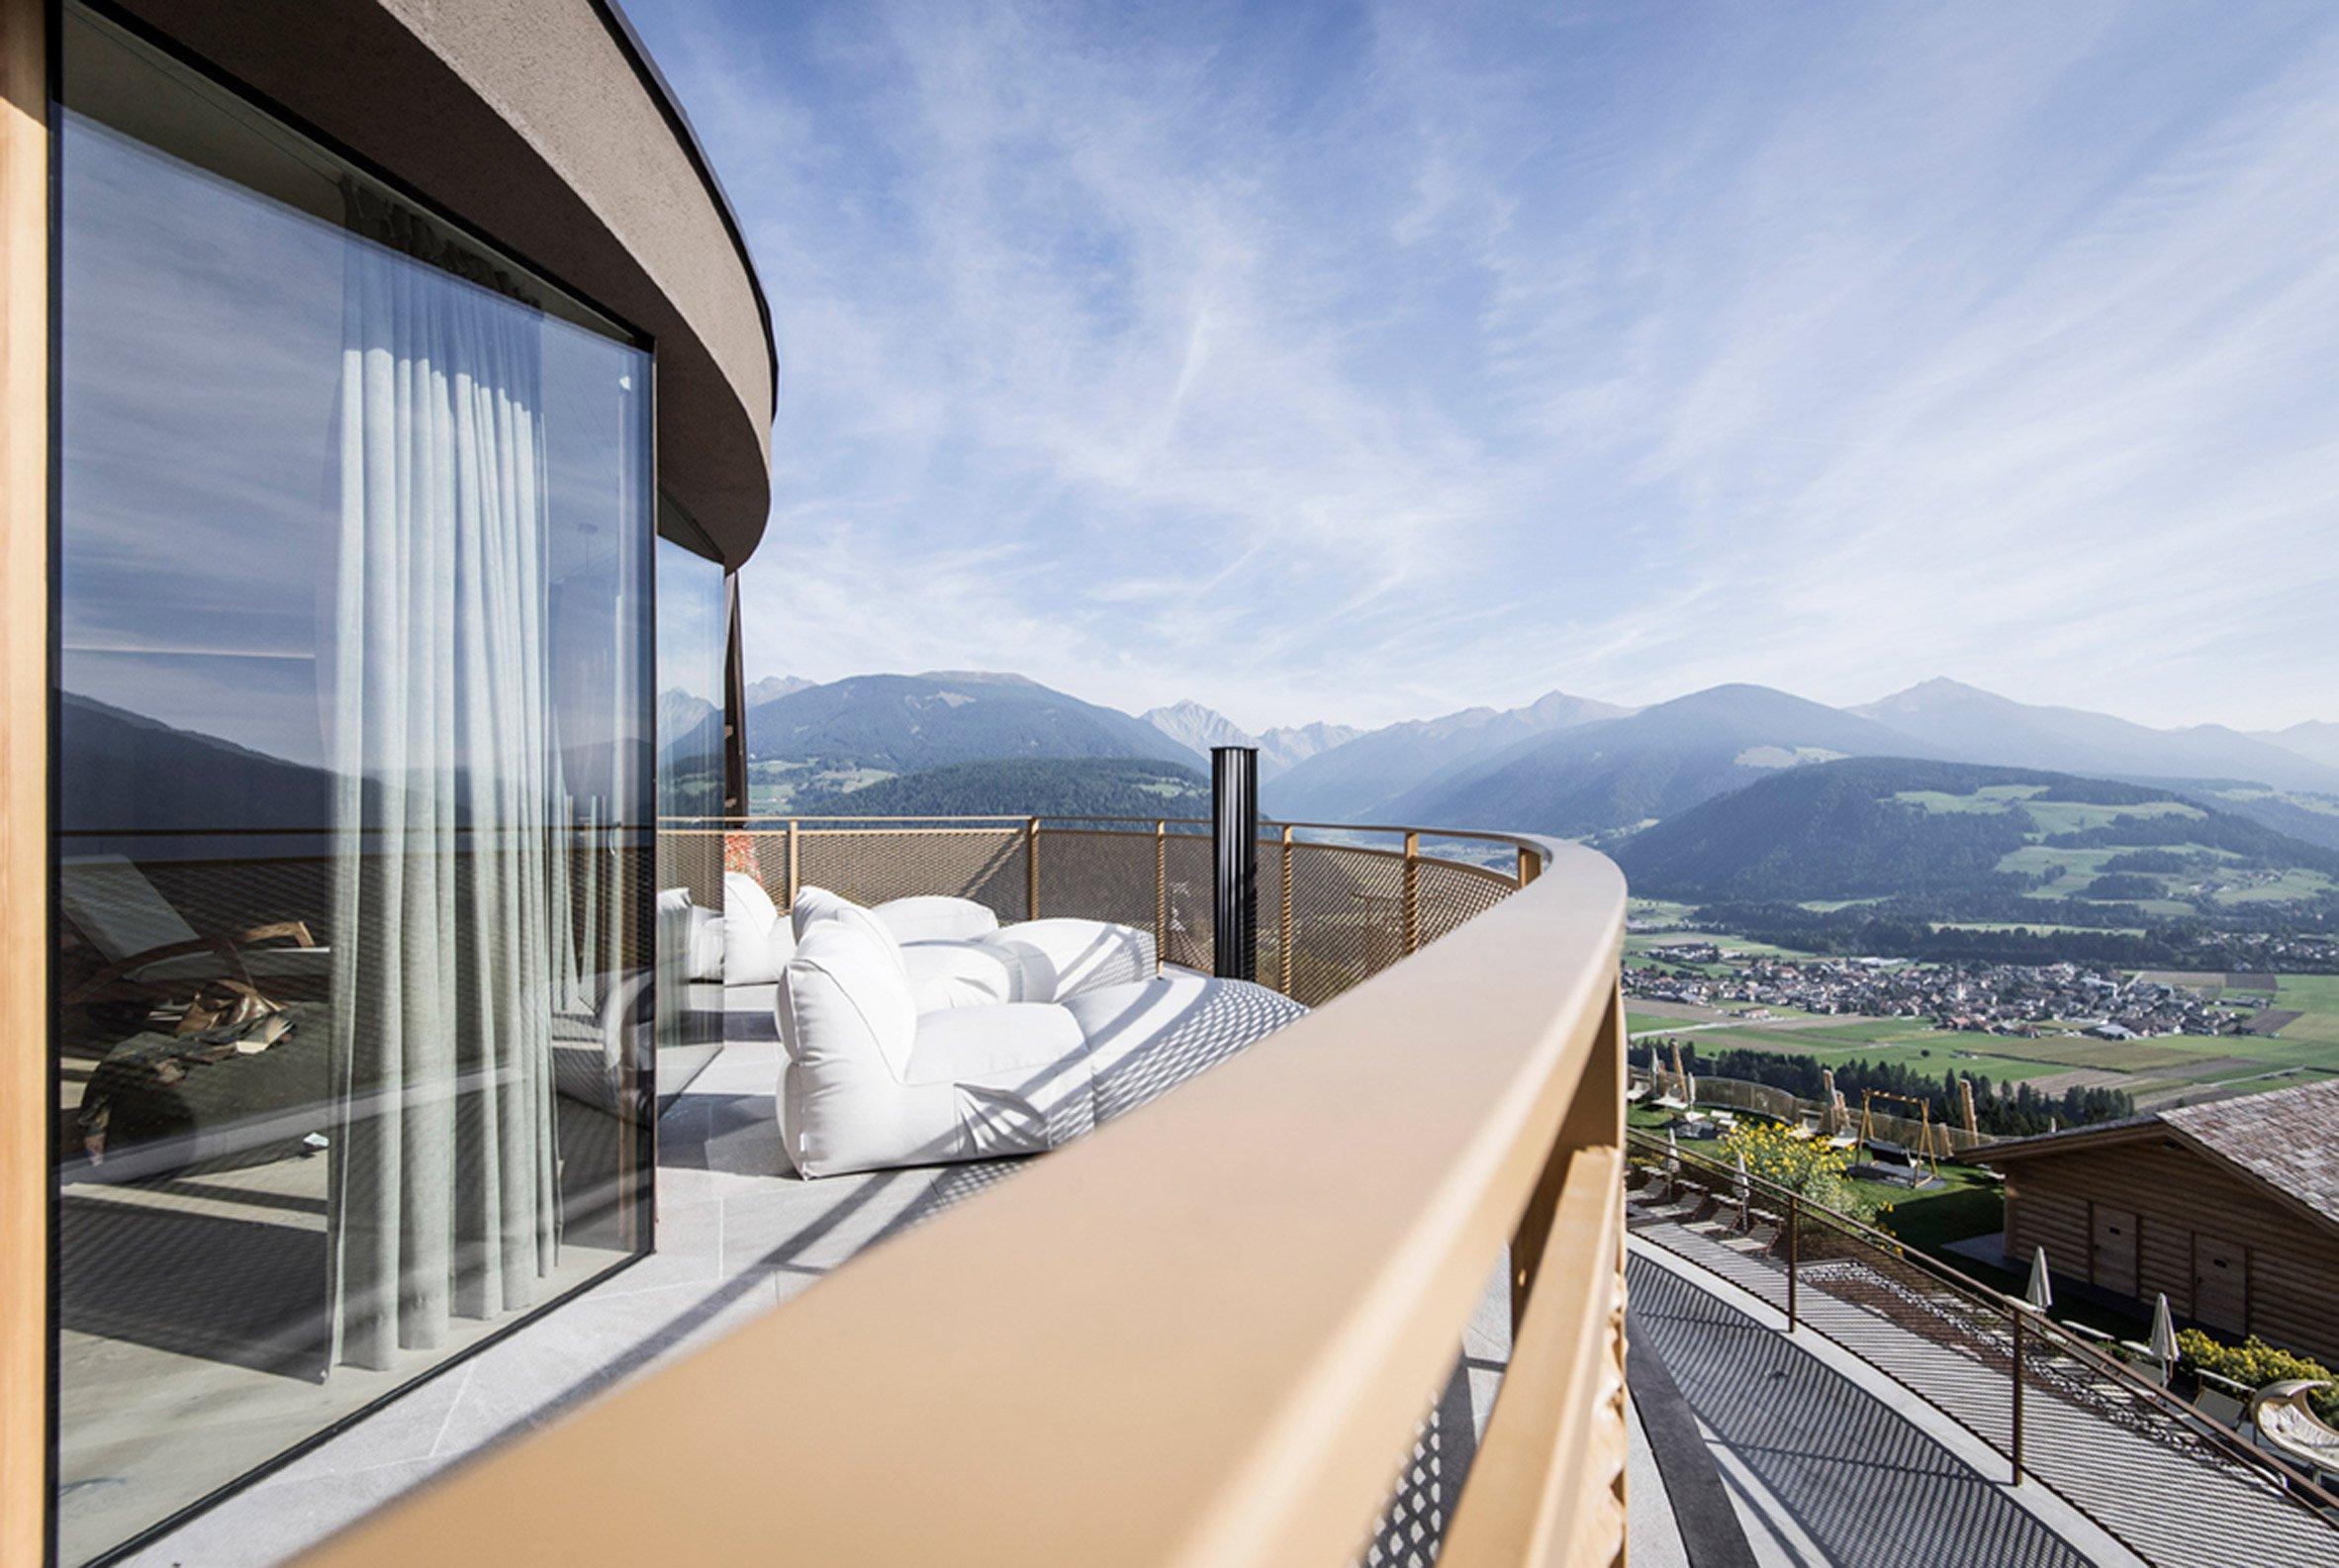 Alpin Panorama Hotel of italy